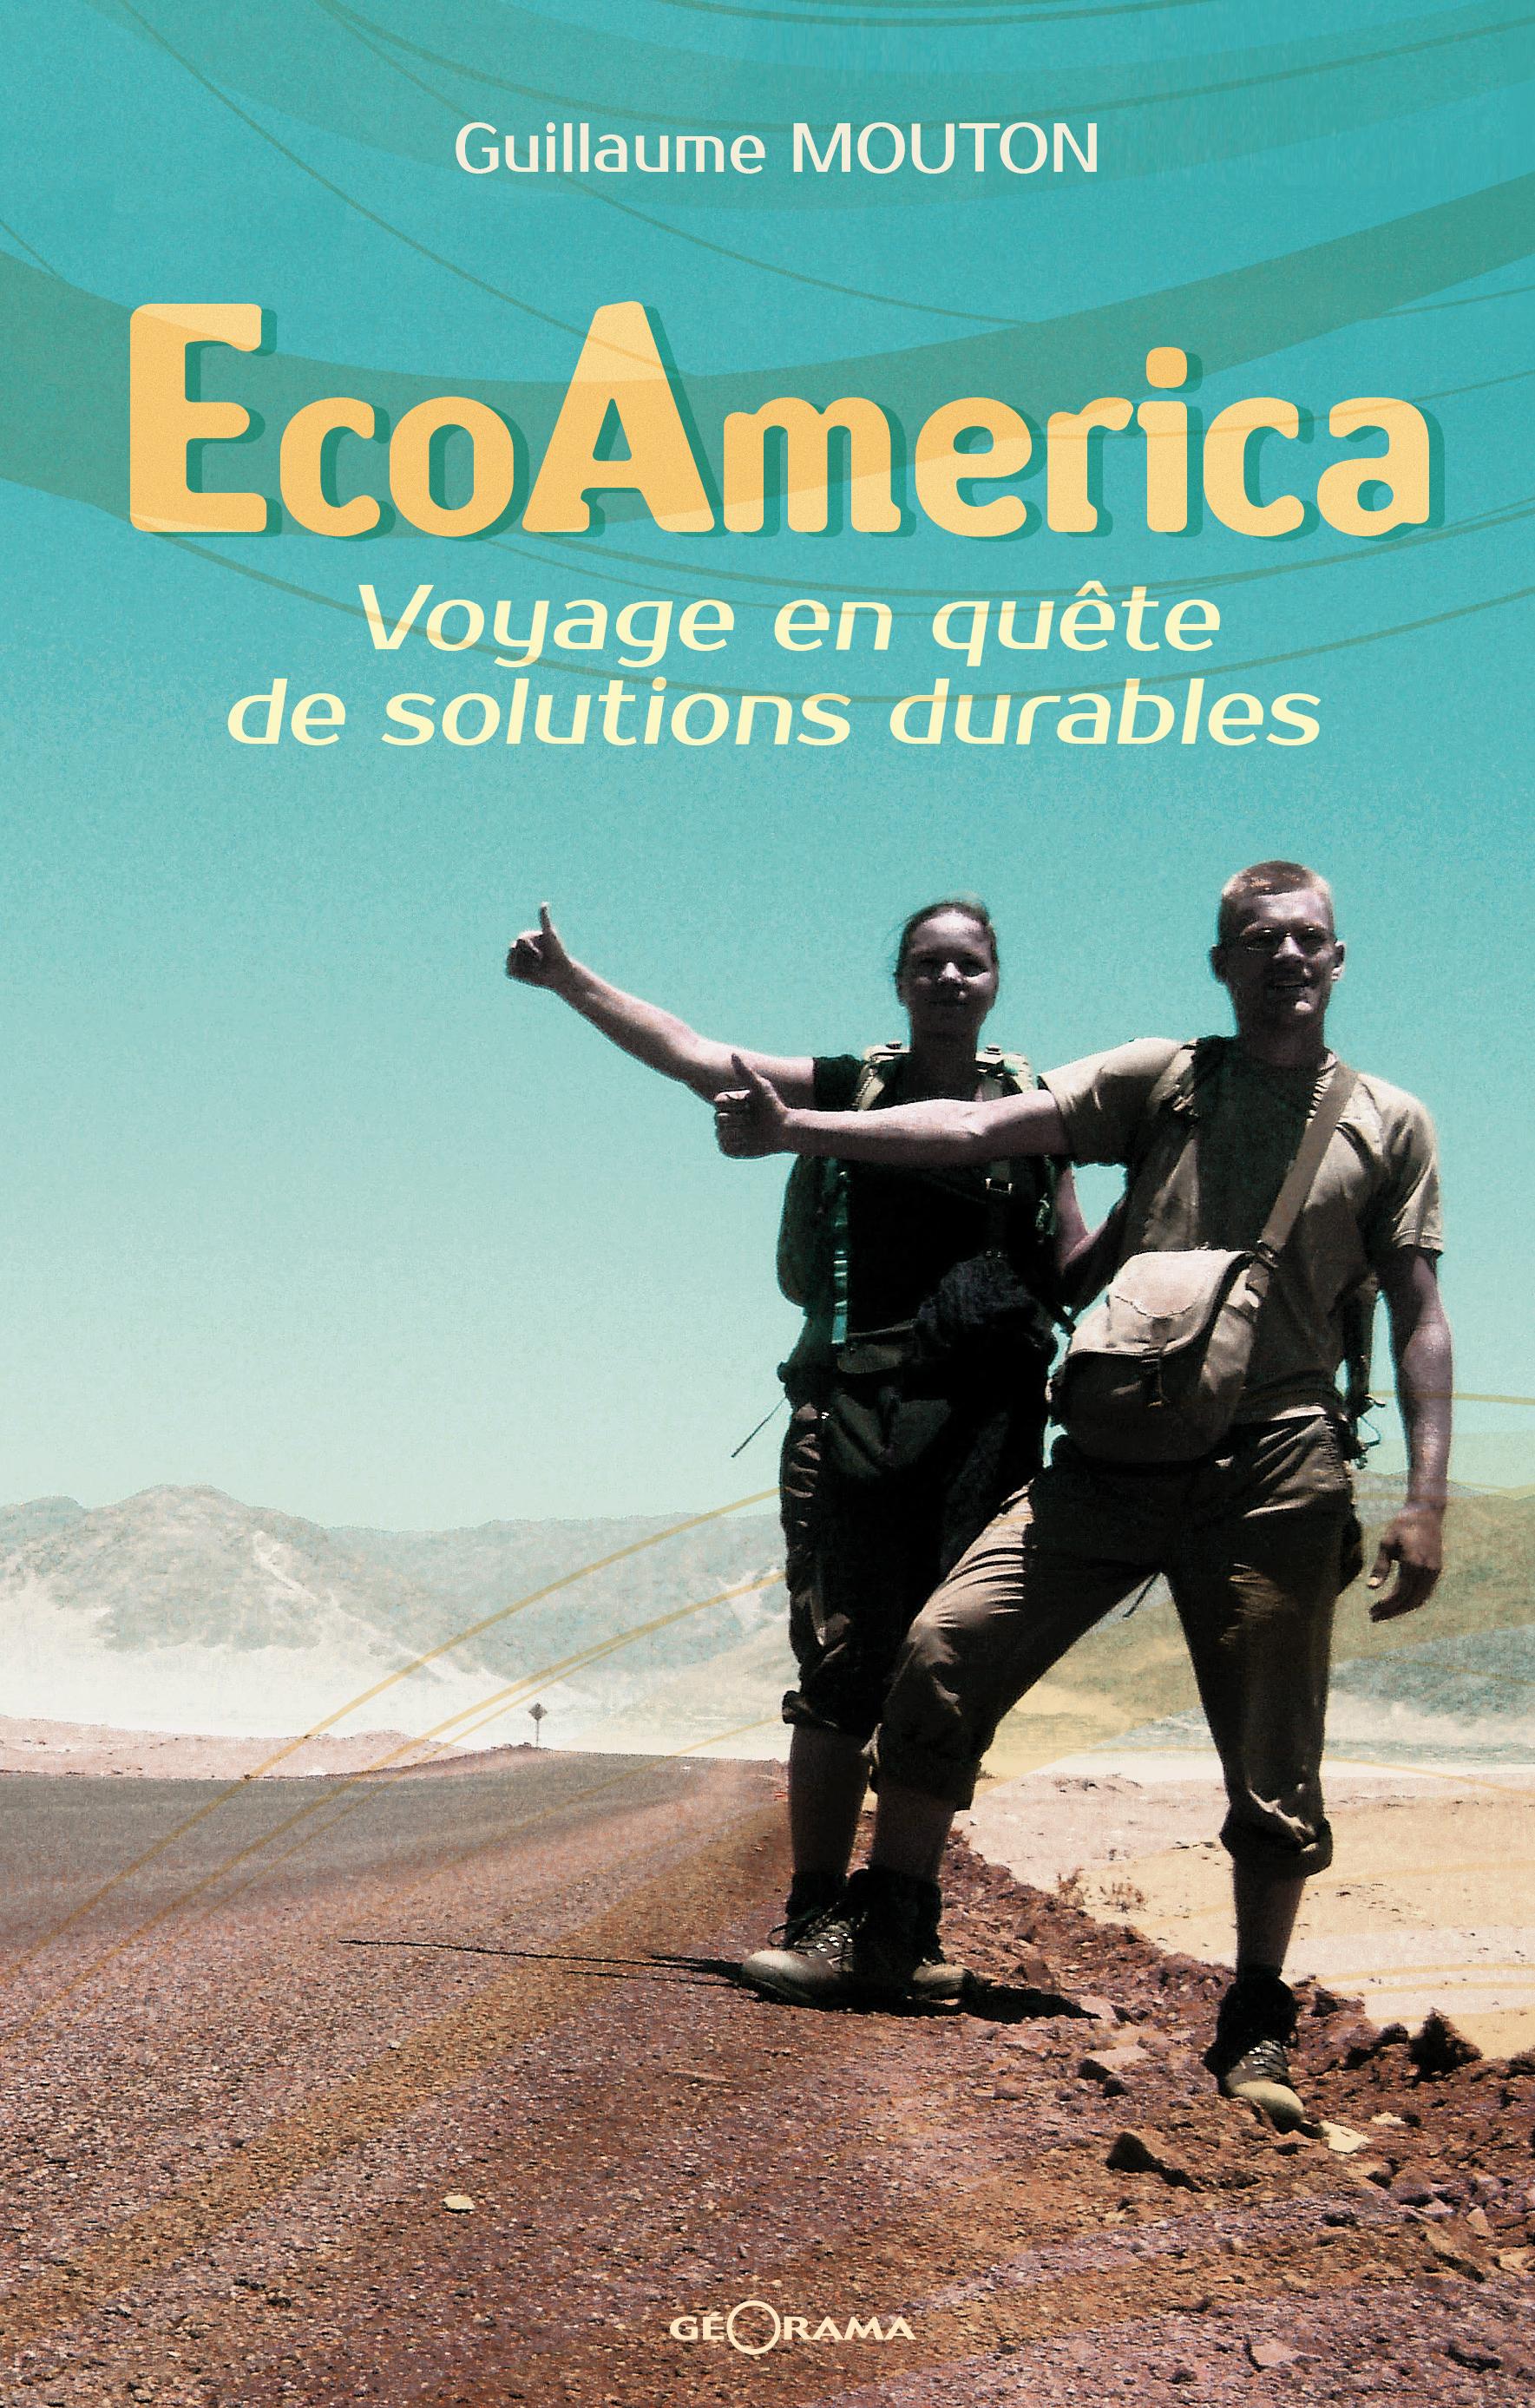 EcoAmerica, VOYAGE EN QUÊTE DE SOLUTIONS DURABLES